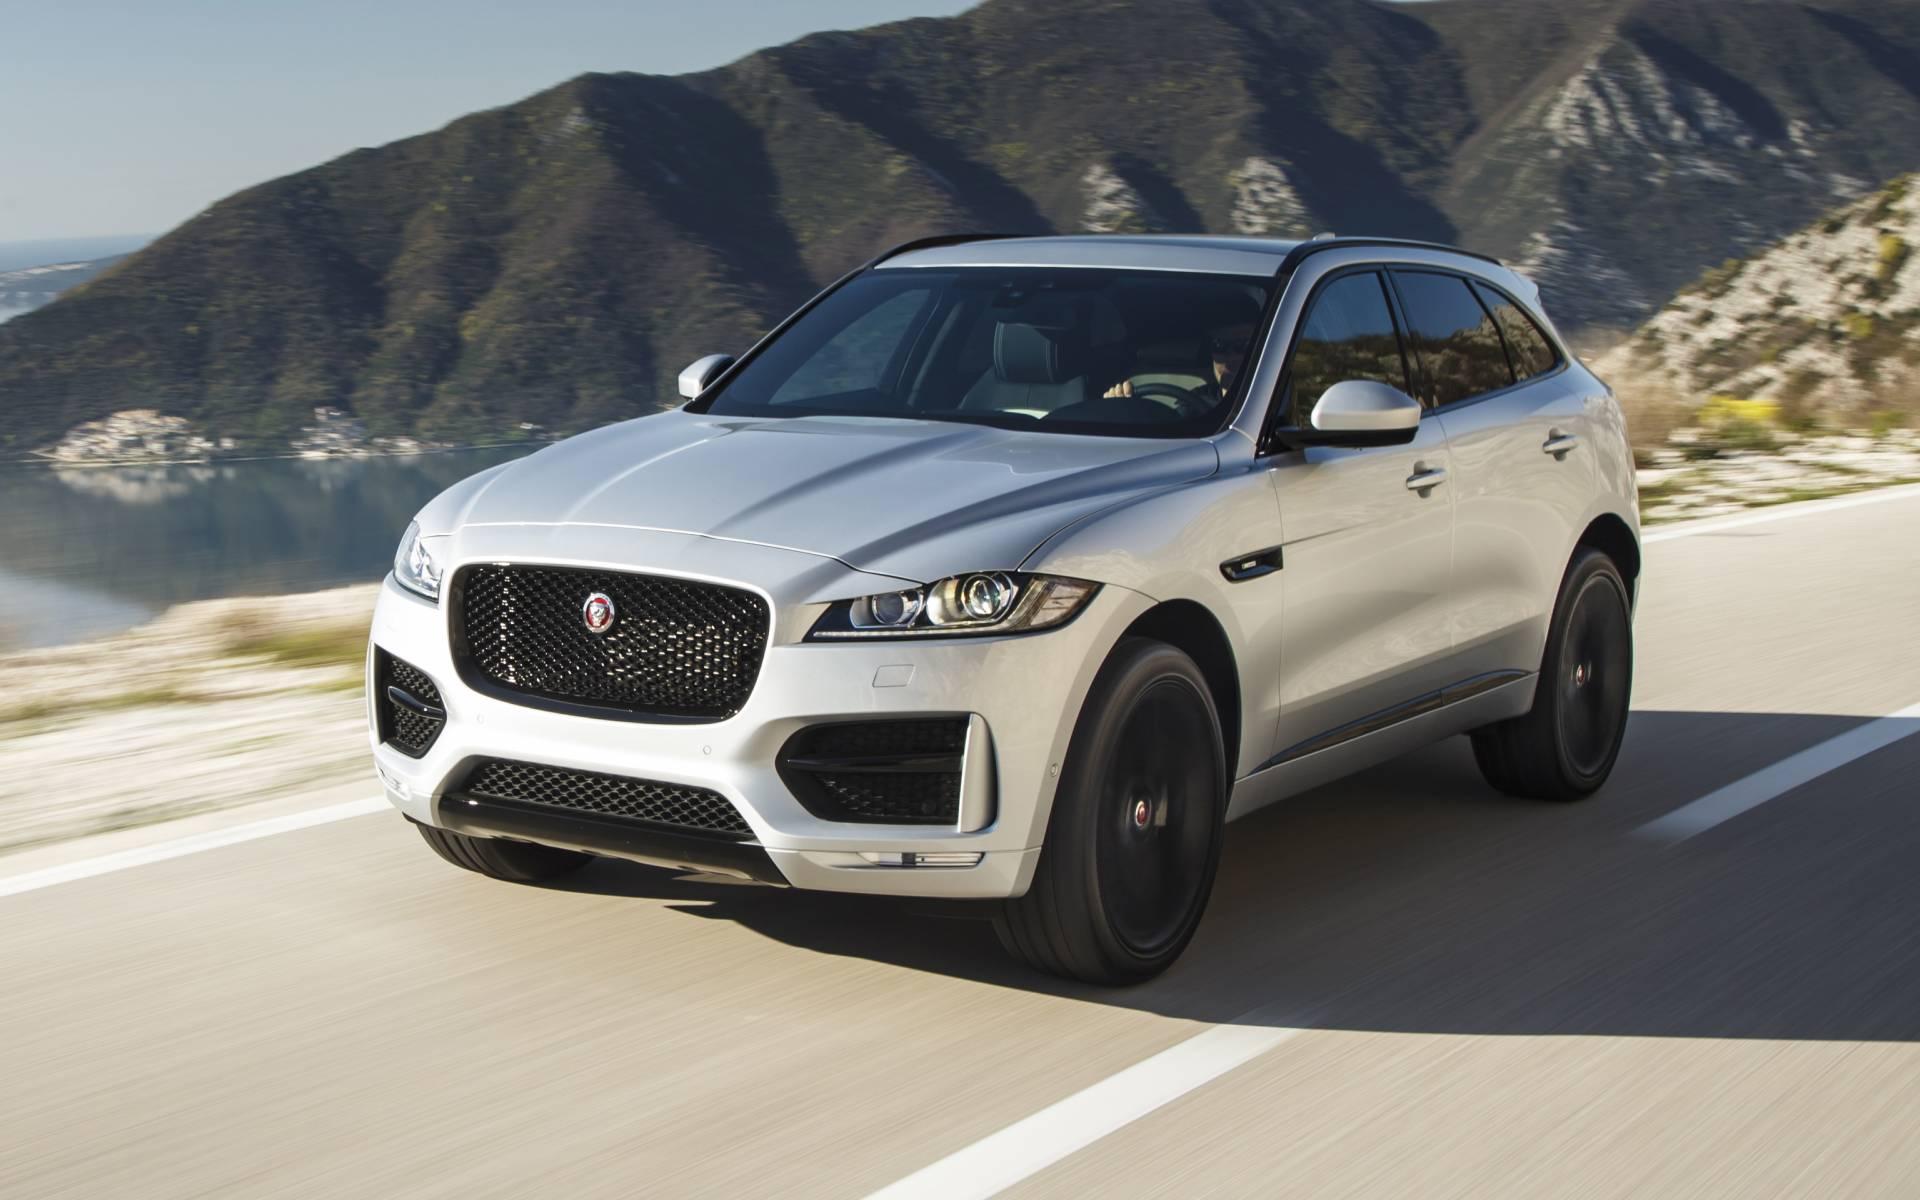 2020 Jaguar Suv Overview